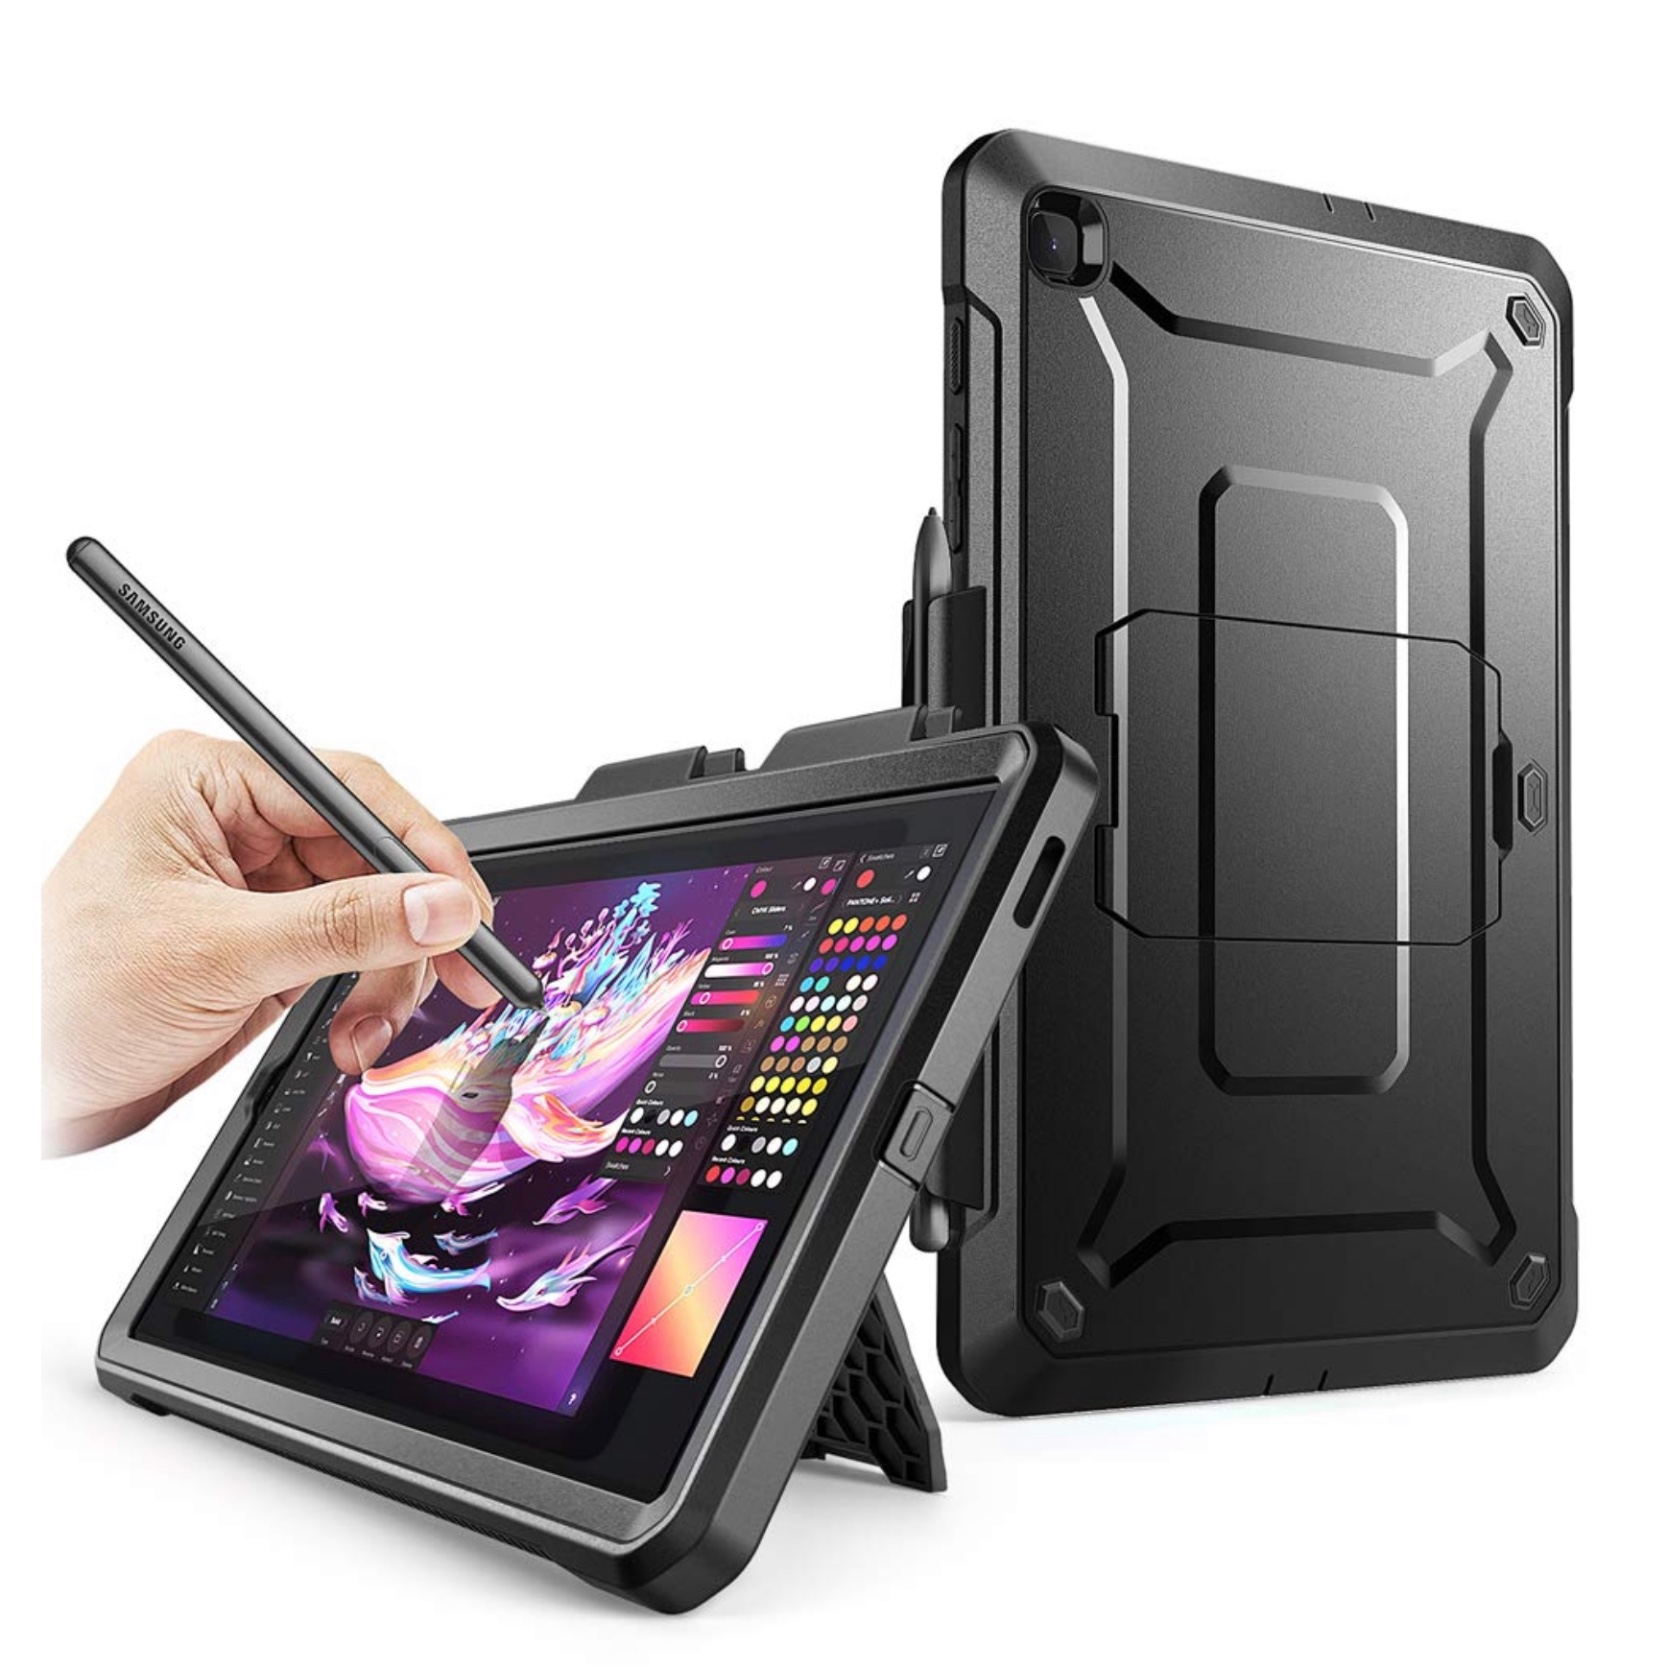 Galaxy TAB S6 LITE 10.4 pouces Footer 2 Film rigide ecran Pied et support stylet